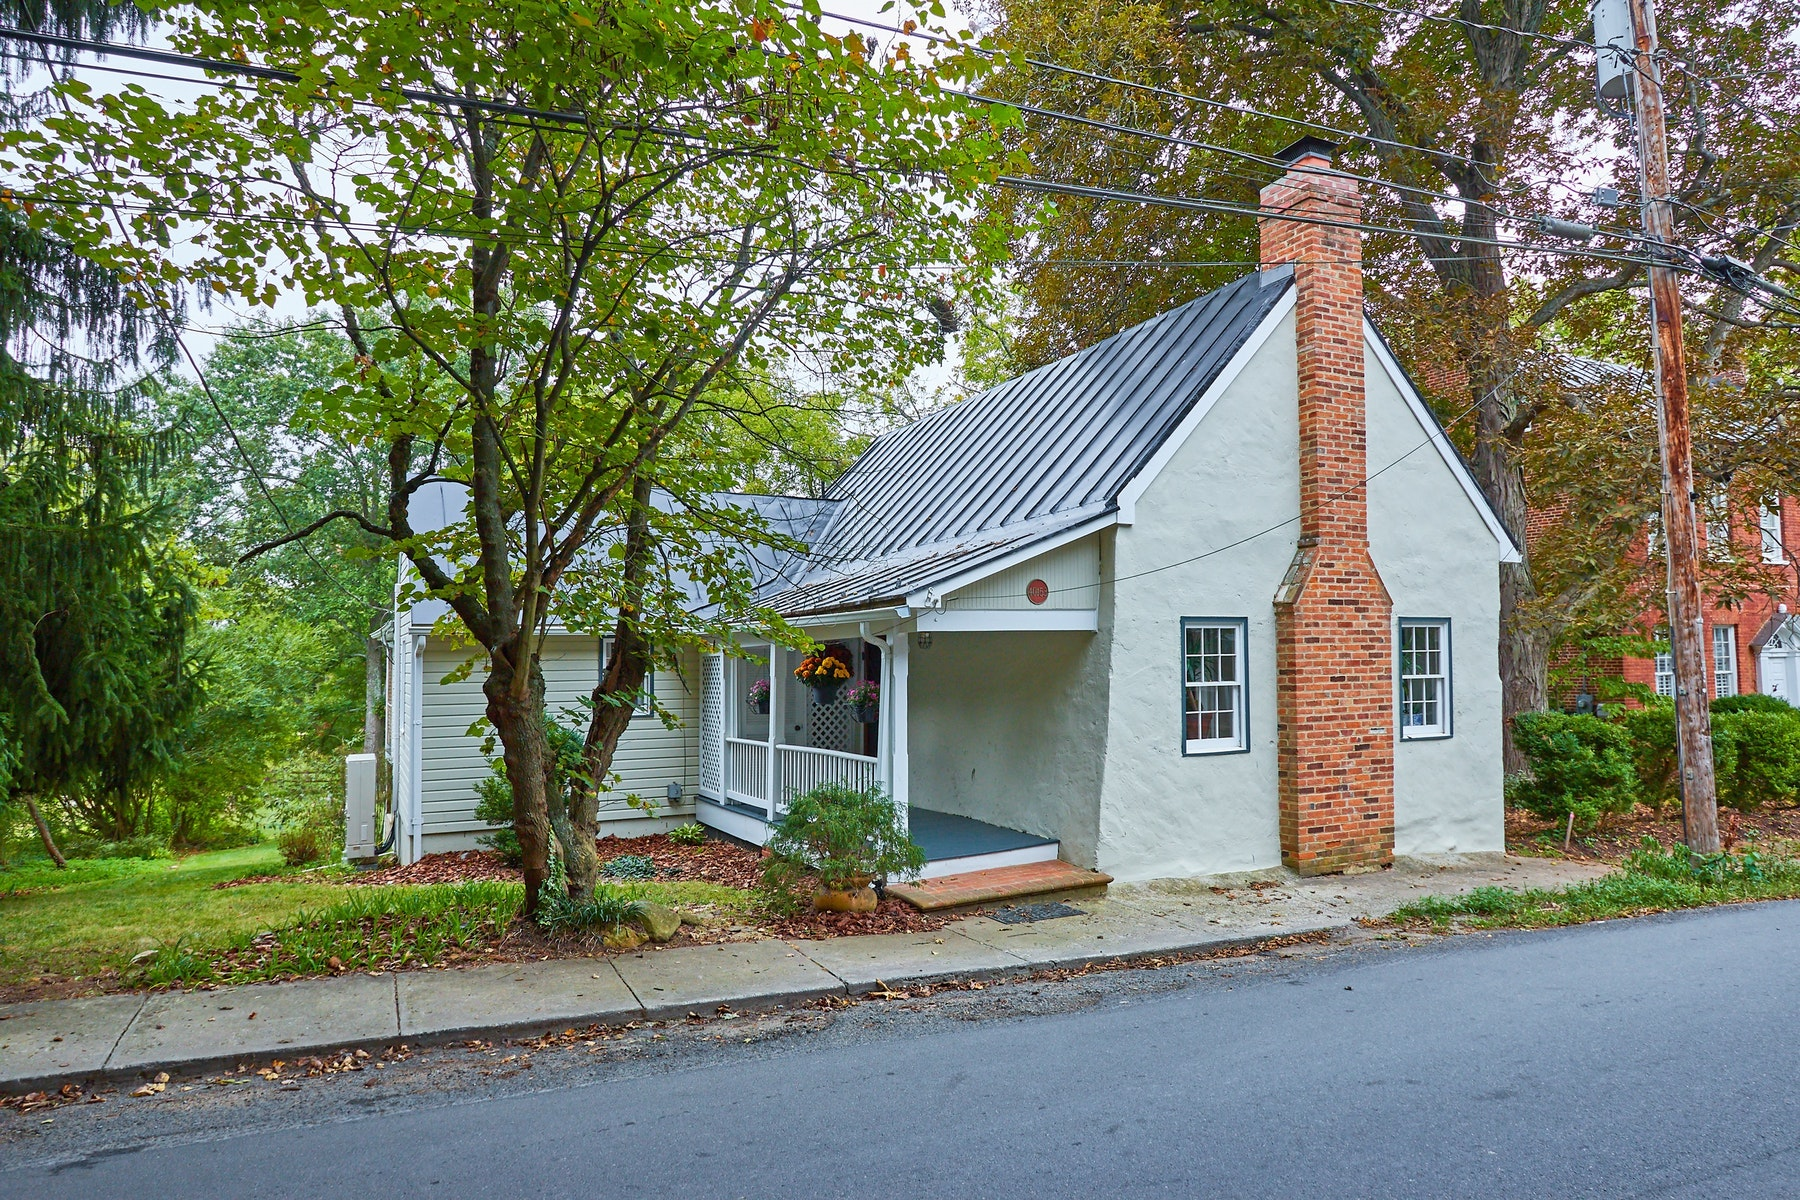 Single Family Homes для того Продажа на The Minnie Jackson House 40153 Main St. Waterford, Виргиния 20197 Соединенные Штаты